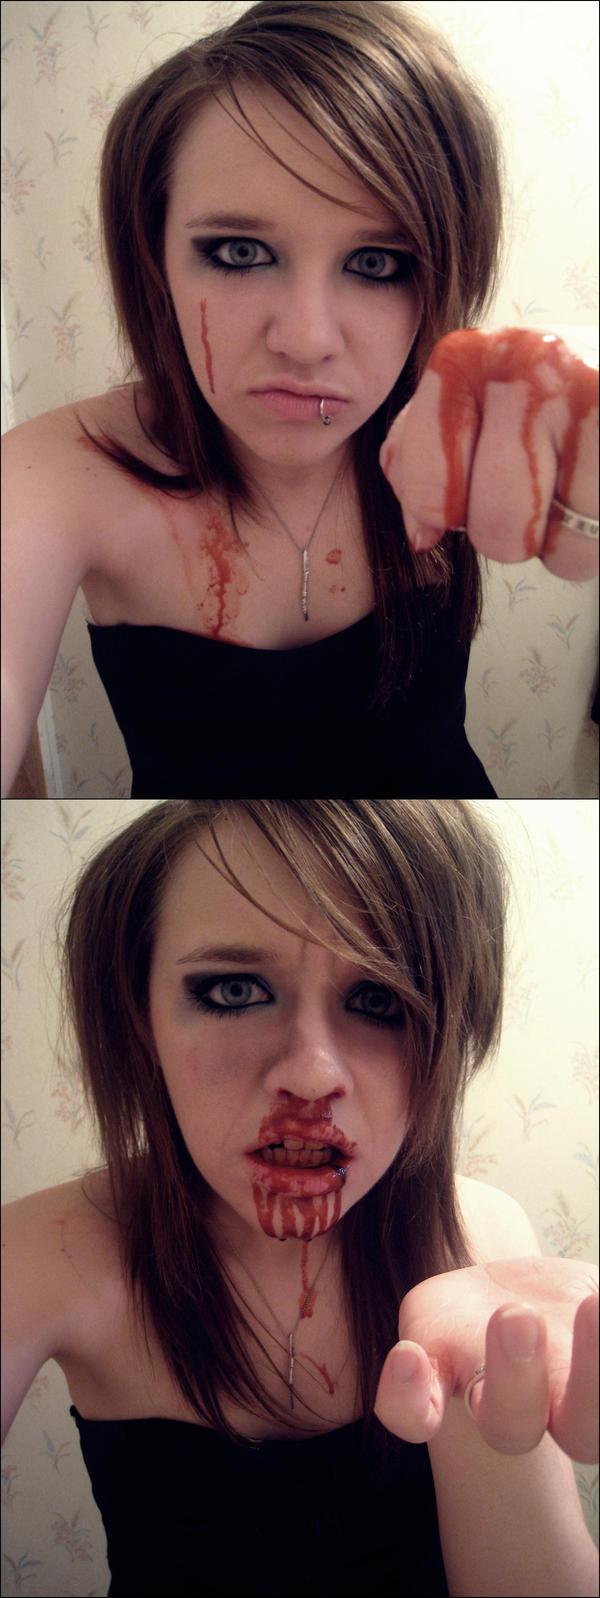 Mutilation Pictures